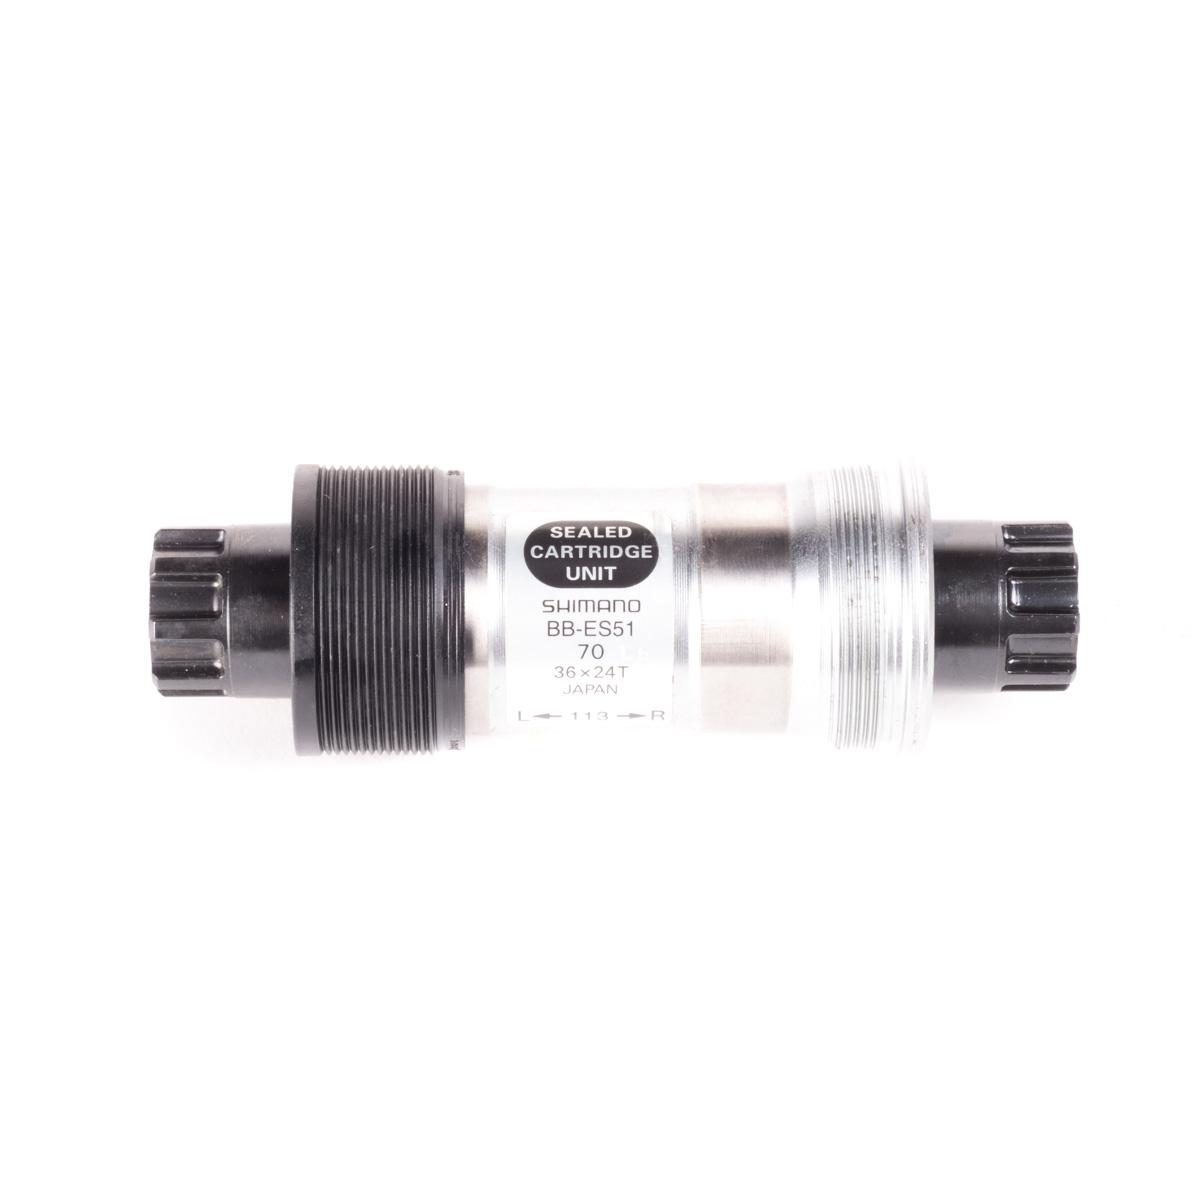 Shimano BB-TY30 Bottom Bracket Square Taper 70 x 122.5mm Black